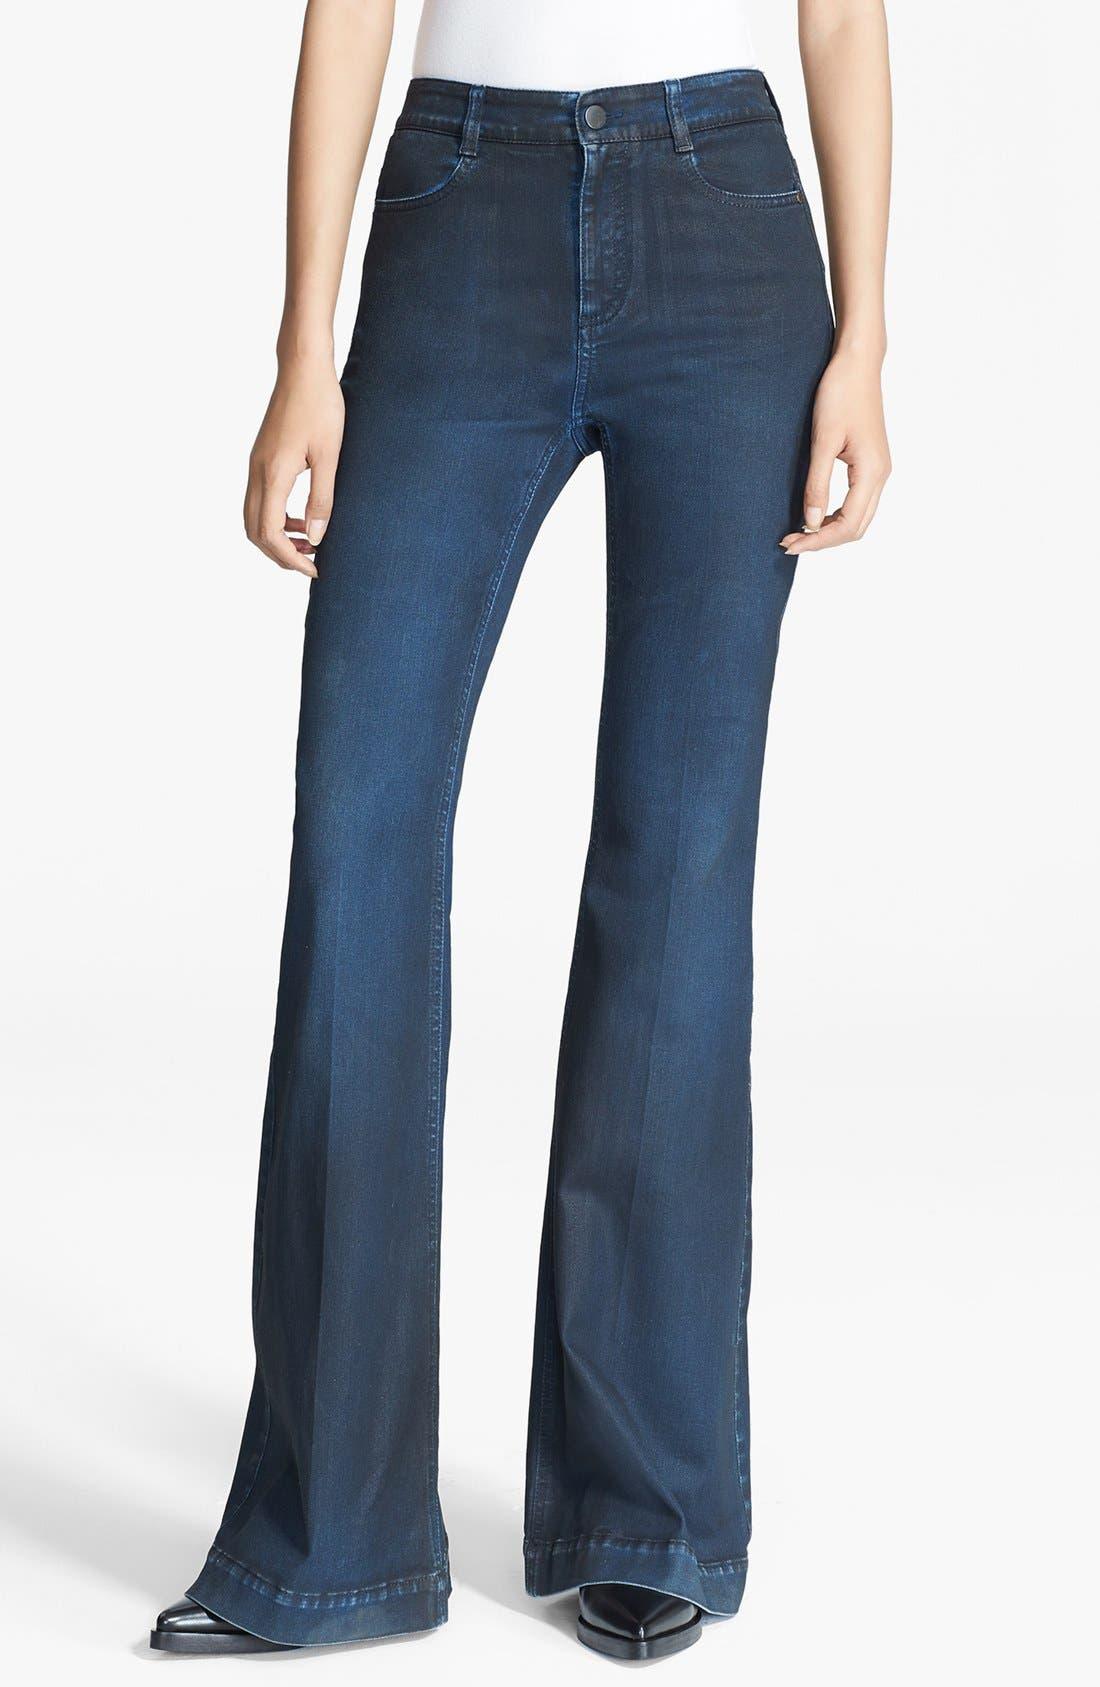 Main Image - Stella McCartney 'The 70's Flare' Jeans